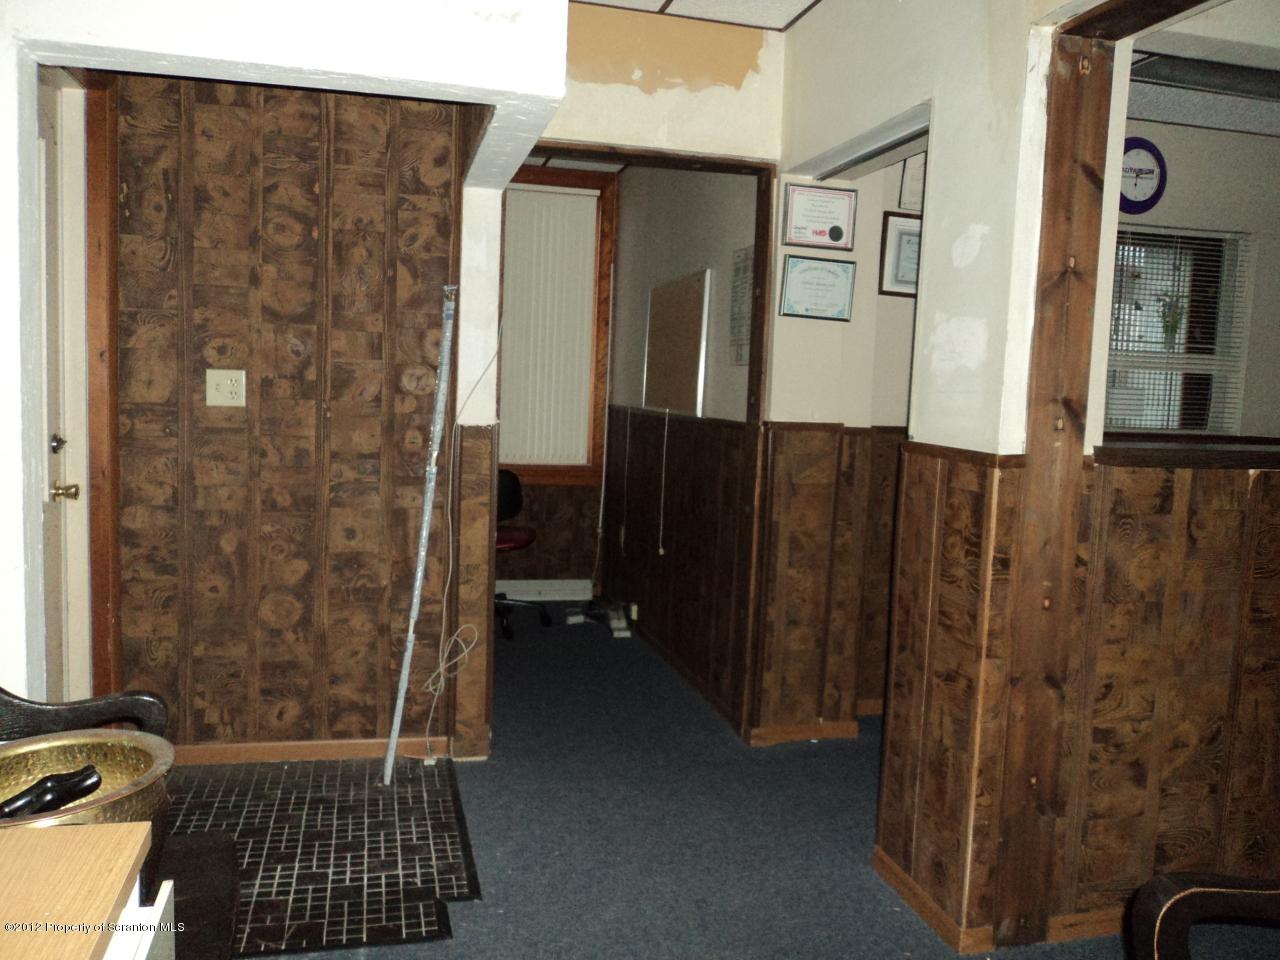 119 Main St, Blakely, Pennsylvania 18447, ,2 BathroomsBathrooms,Commercial,For Lease,Main,12-5088